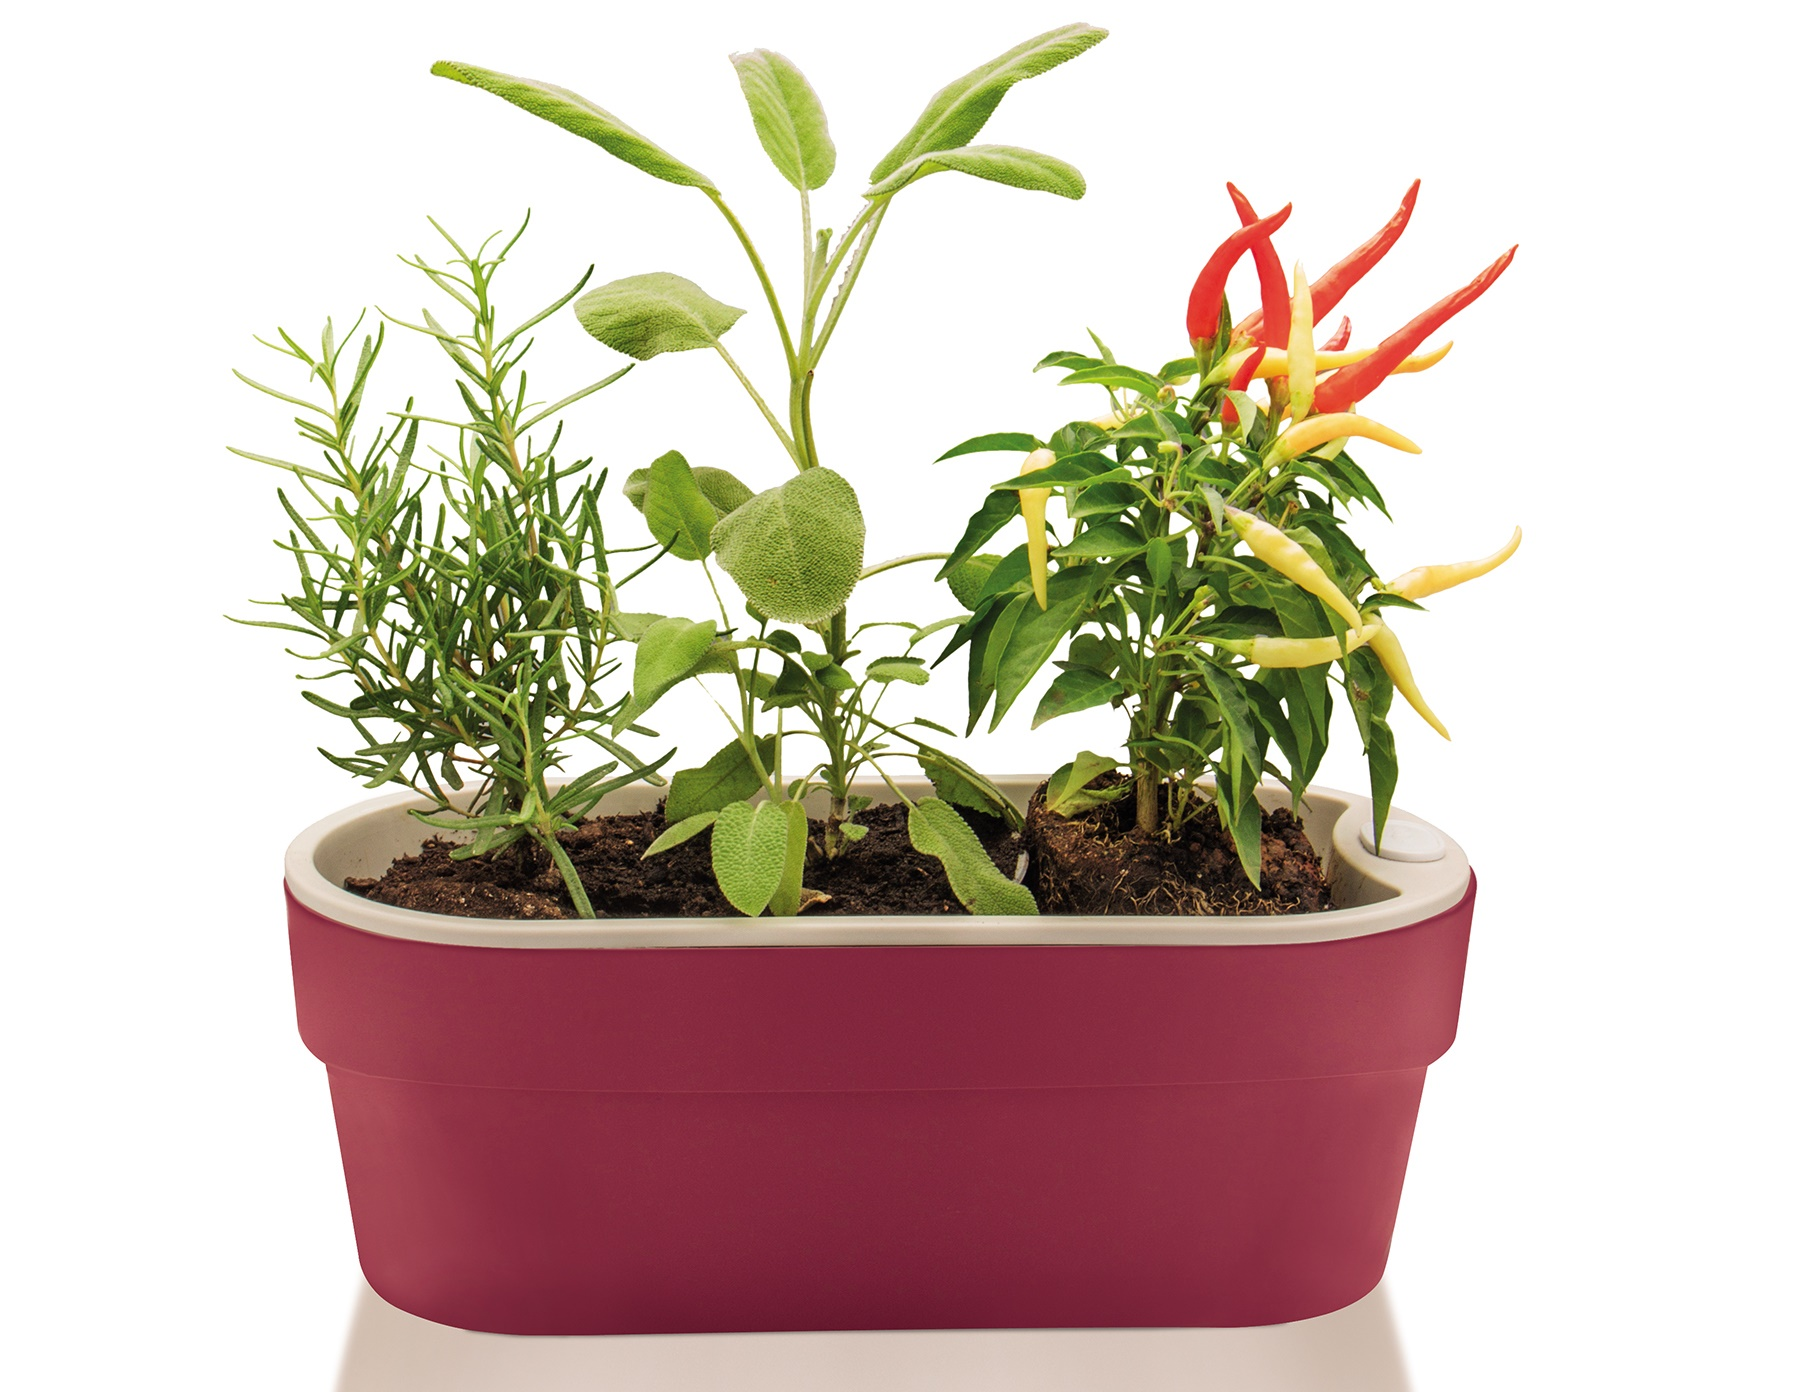 Vaso autoirrig vel novidade que mant m as plantas hidratadas for Plantas baratas